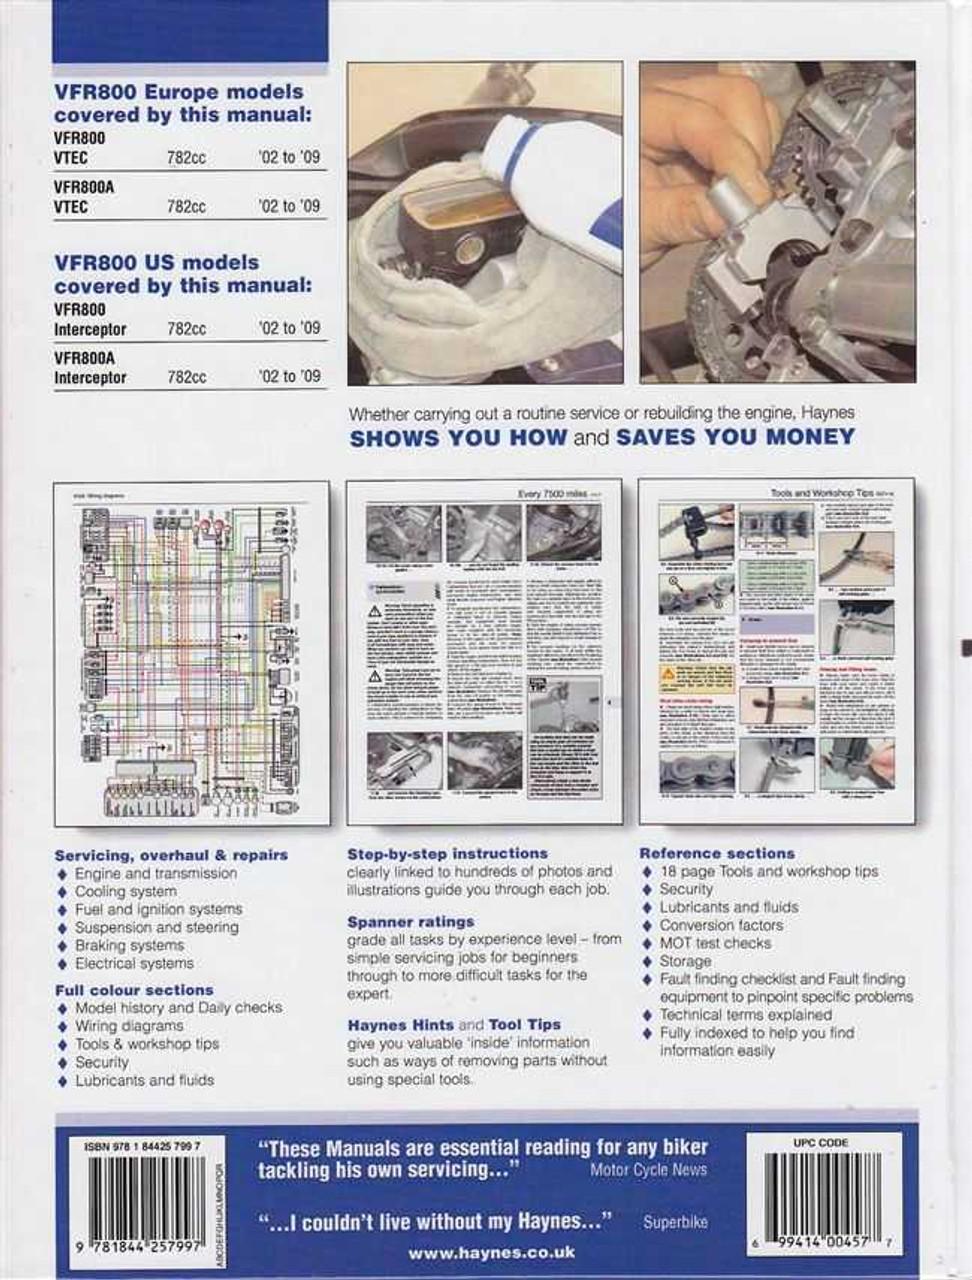 Honda Vfr 800 Manual 2006